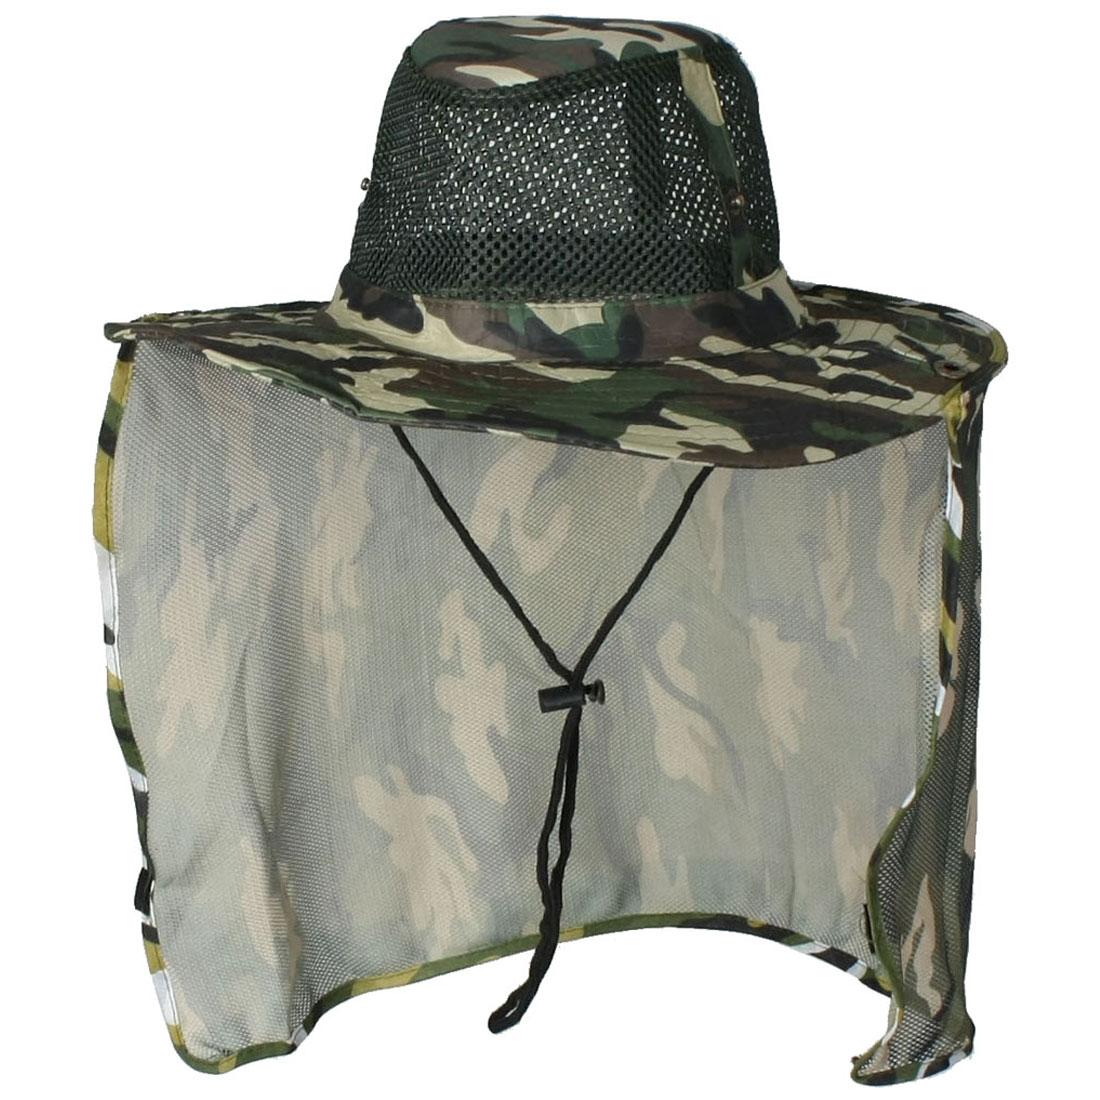 Unisex Adjustable Chin Strap Camouflage Print Flap Bucket Hat